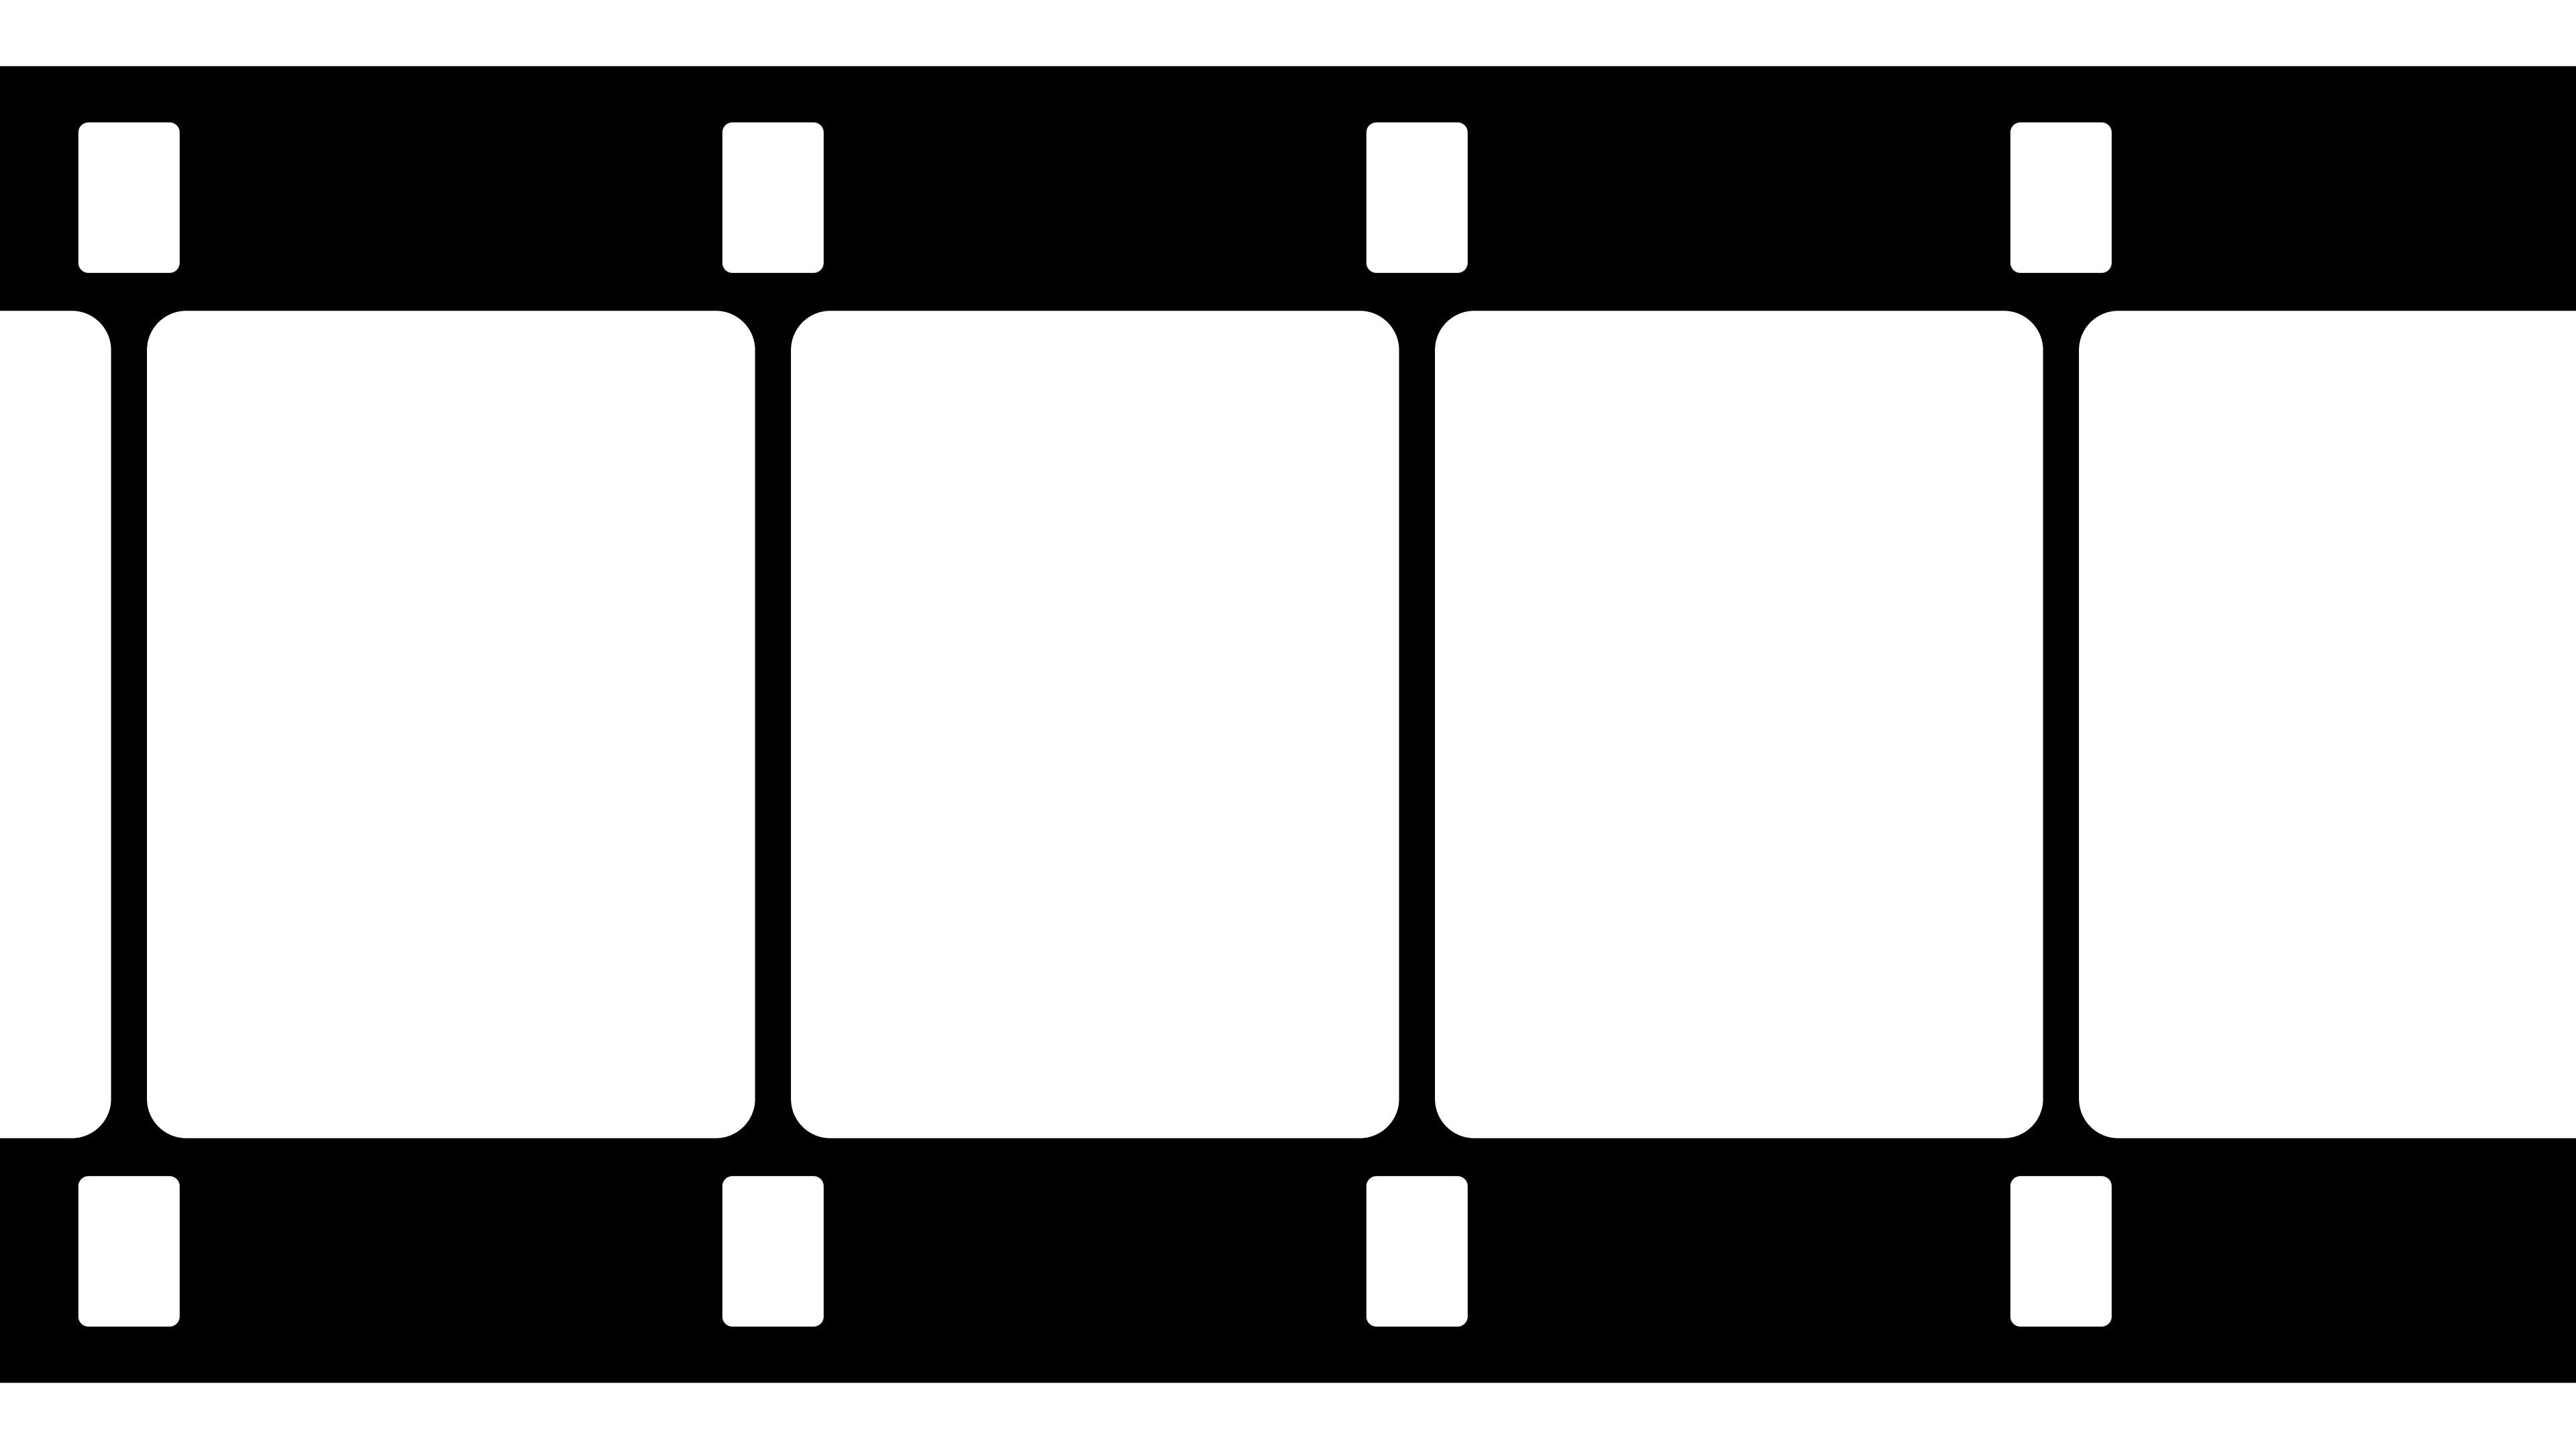 16mm Film Strip Black and White Video Footage ~ Hi Res #69729856.